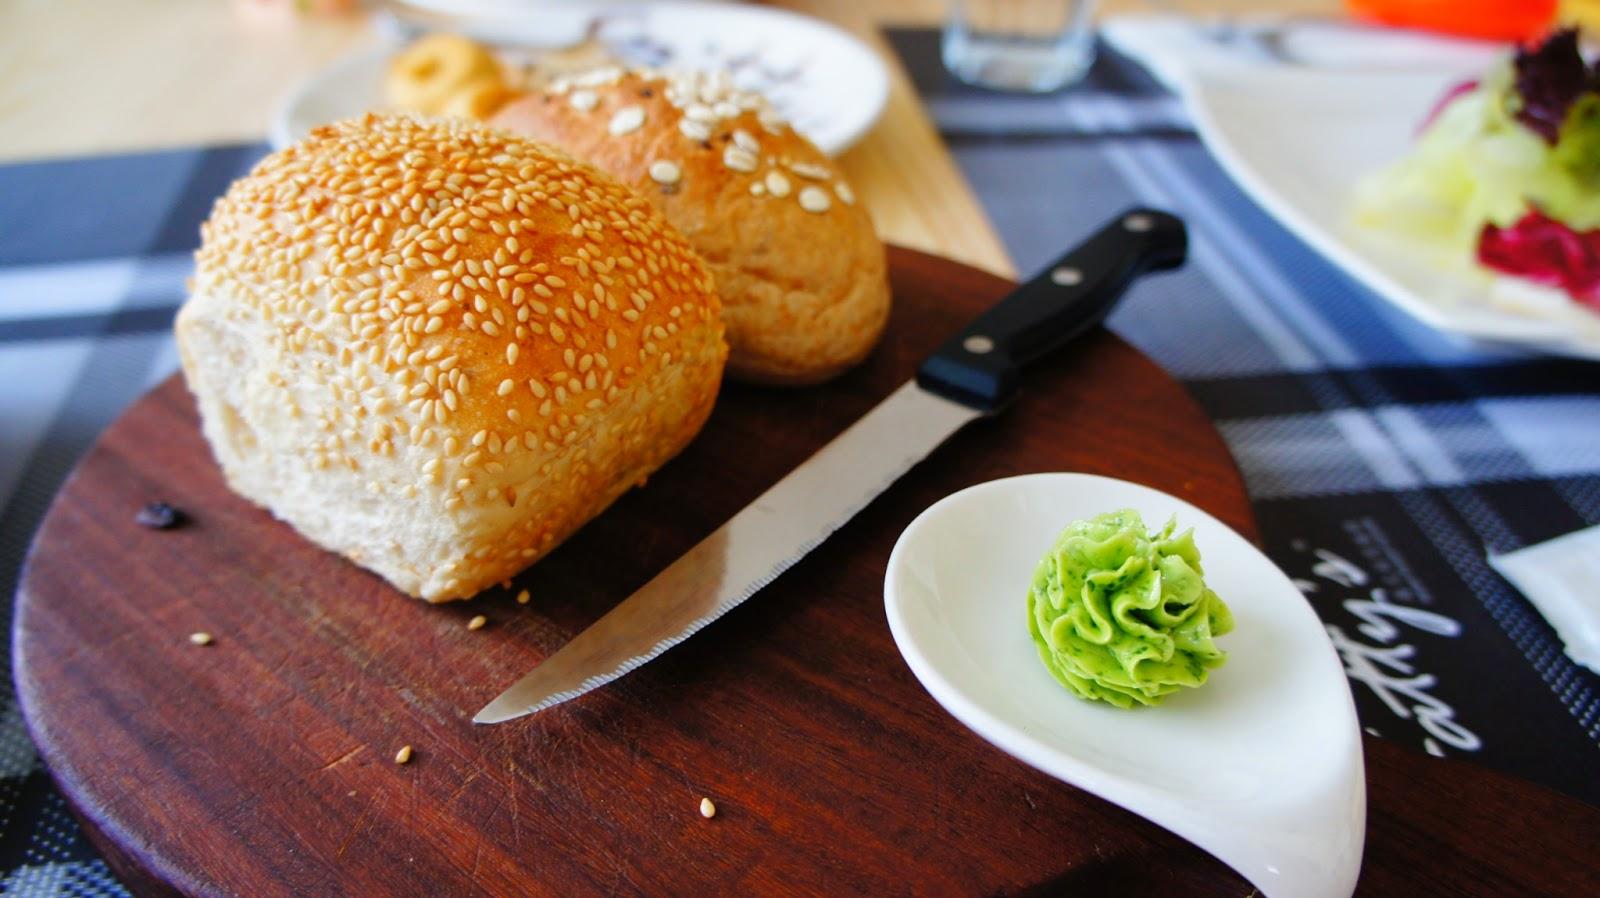 AfersonTalk : [食記]FATTY'S 義式創意餐廳-台中公益店